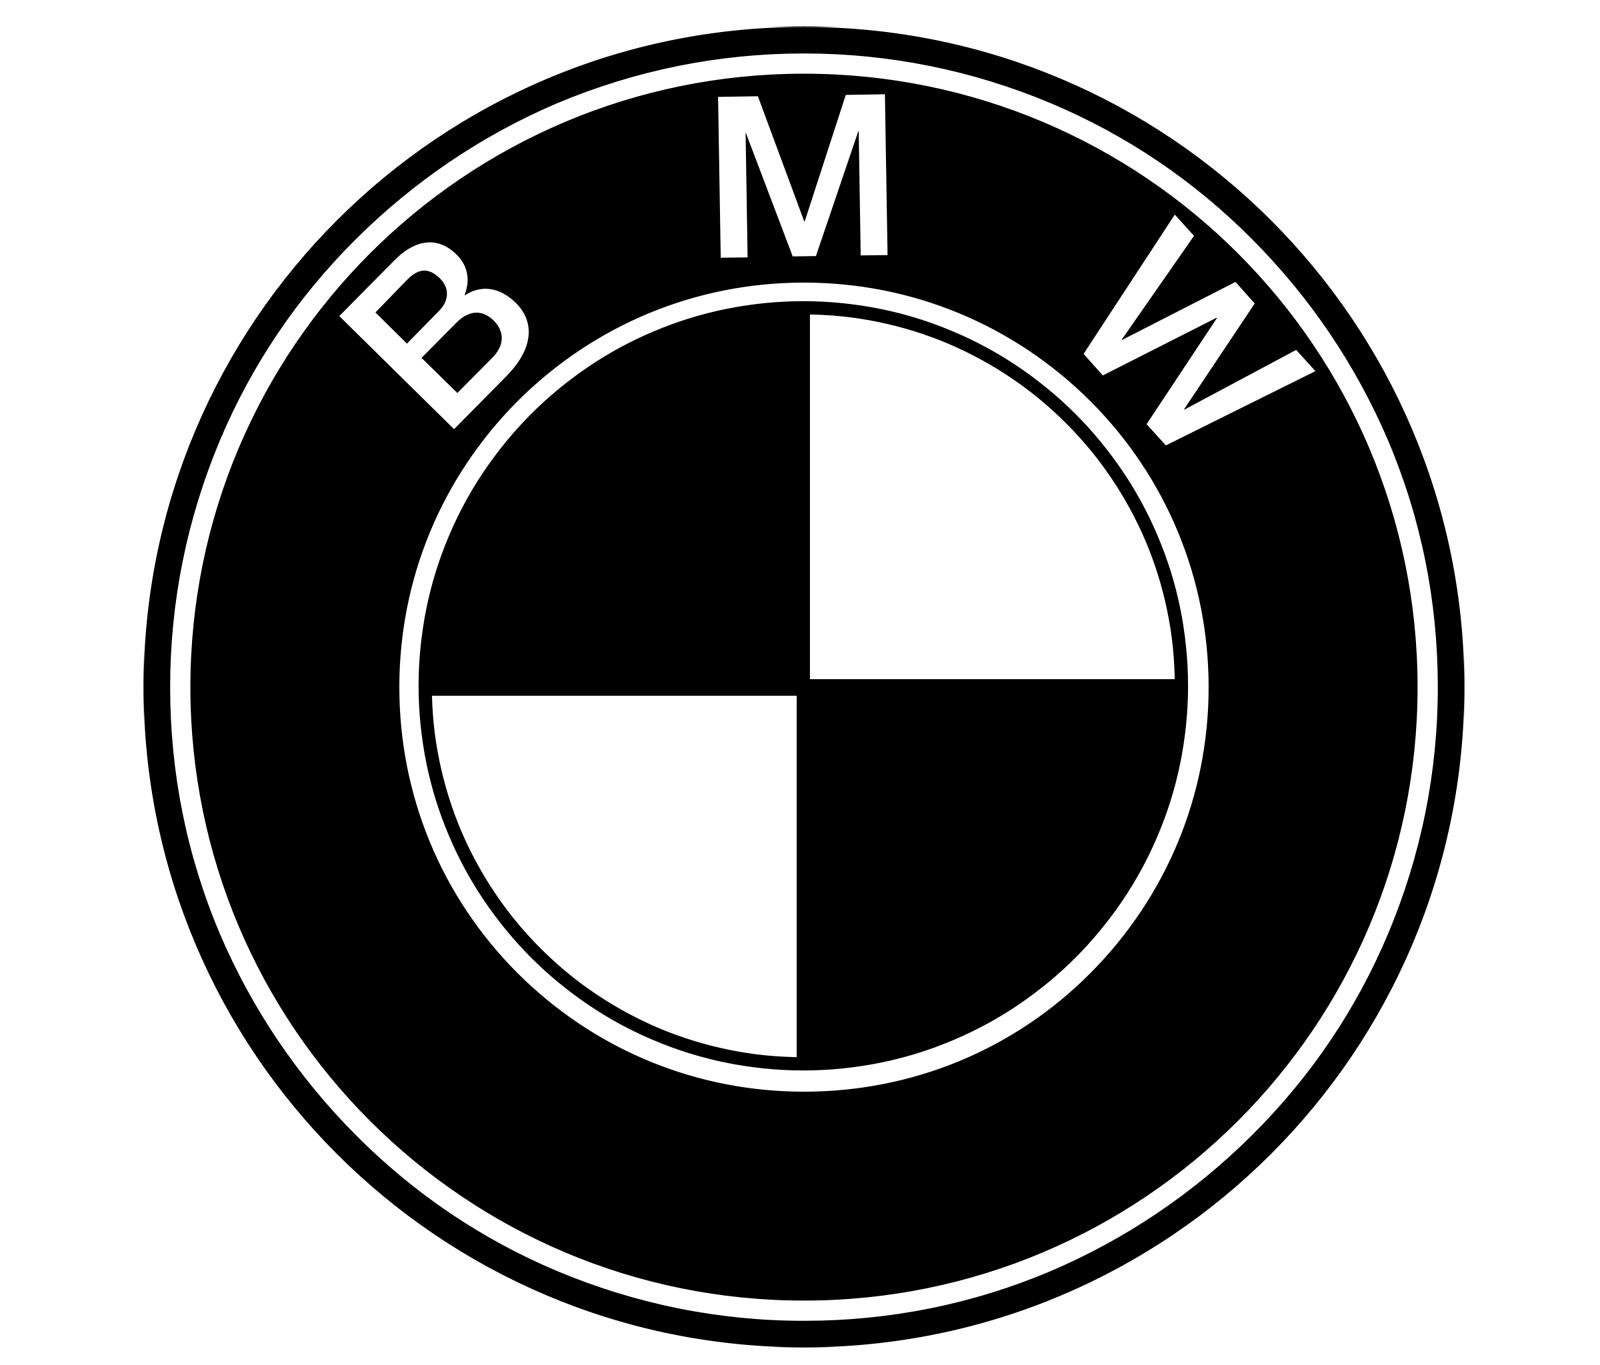 la description du logo bmw. Black Bedroom Furniture Sets. Home Design Ideas